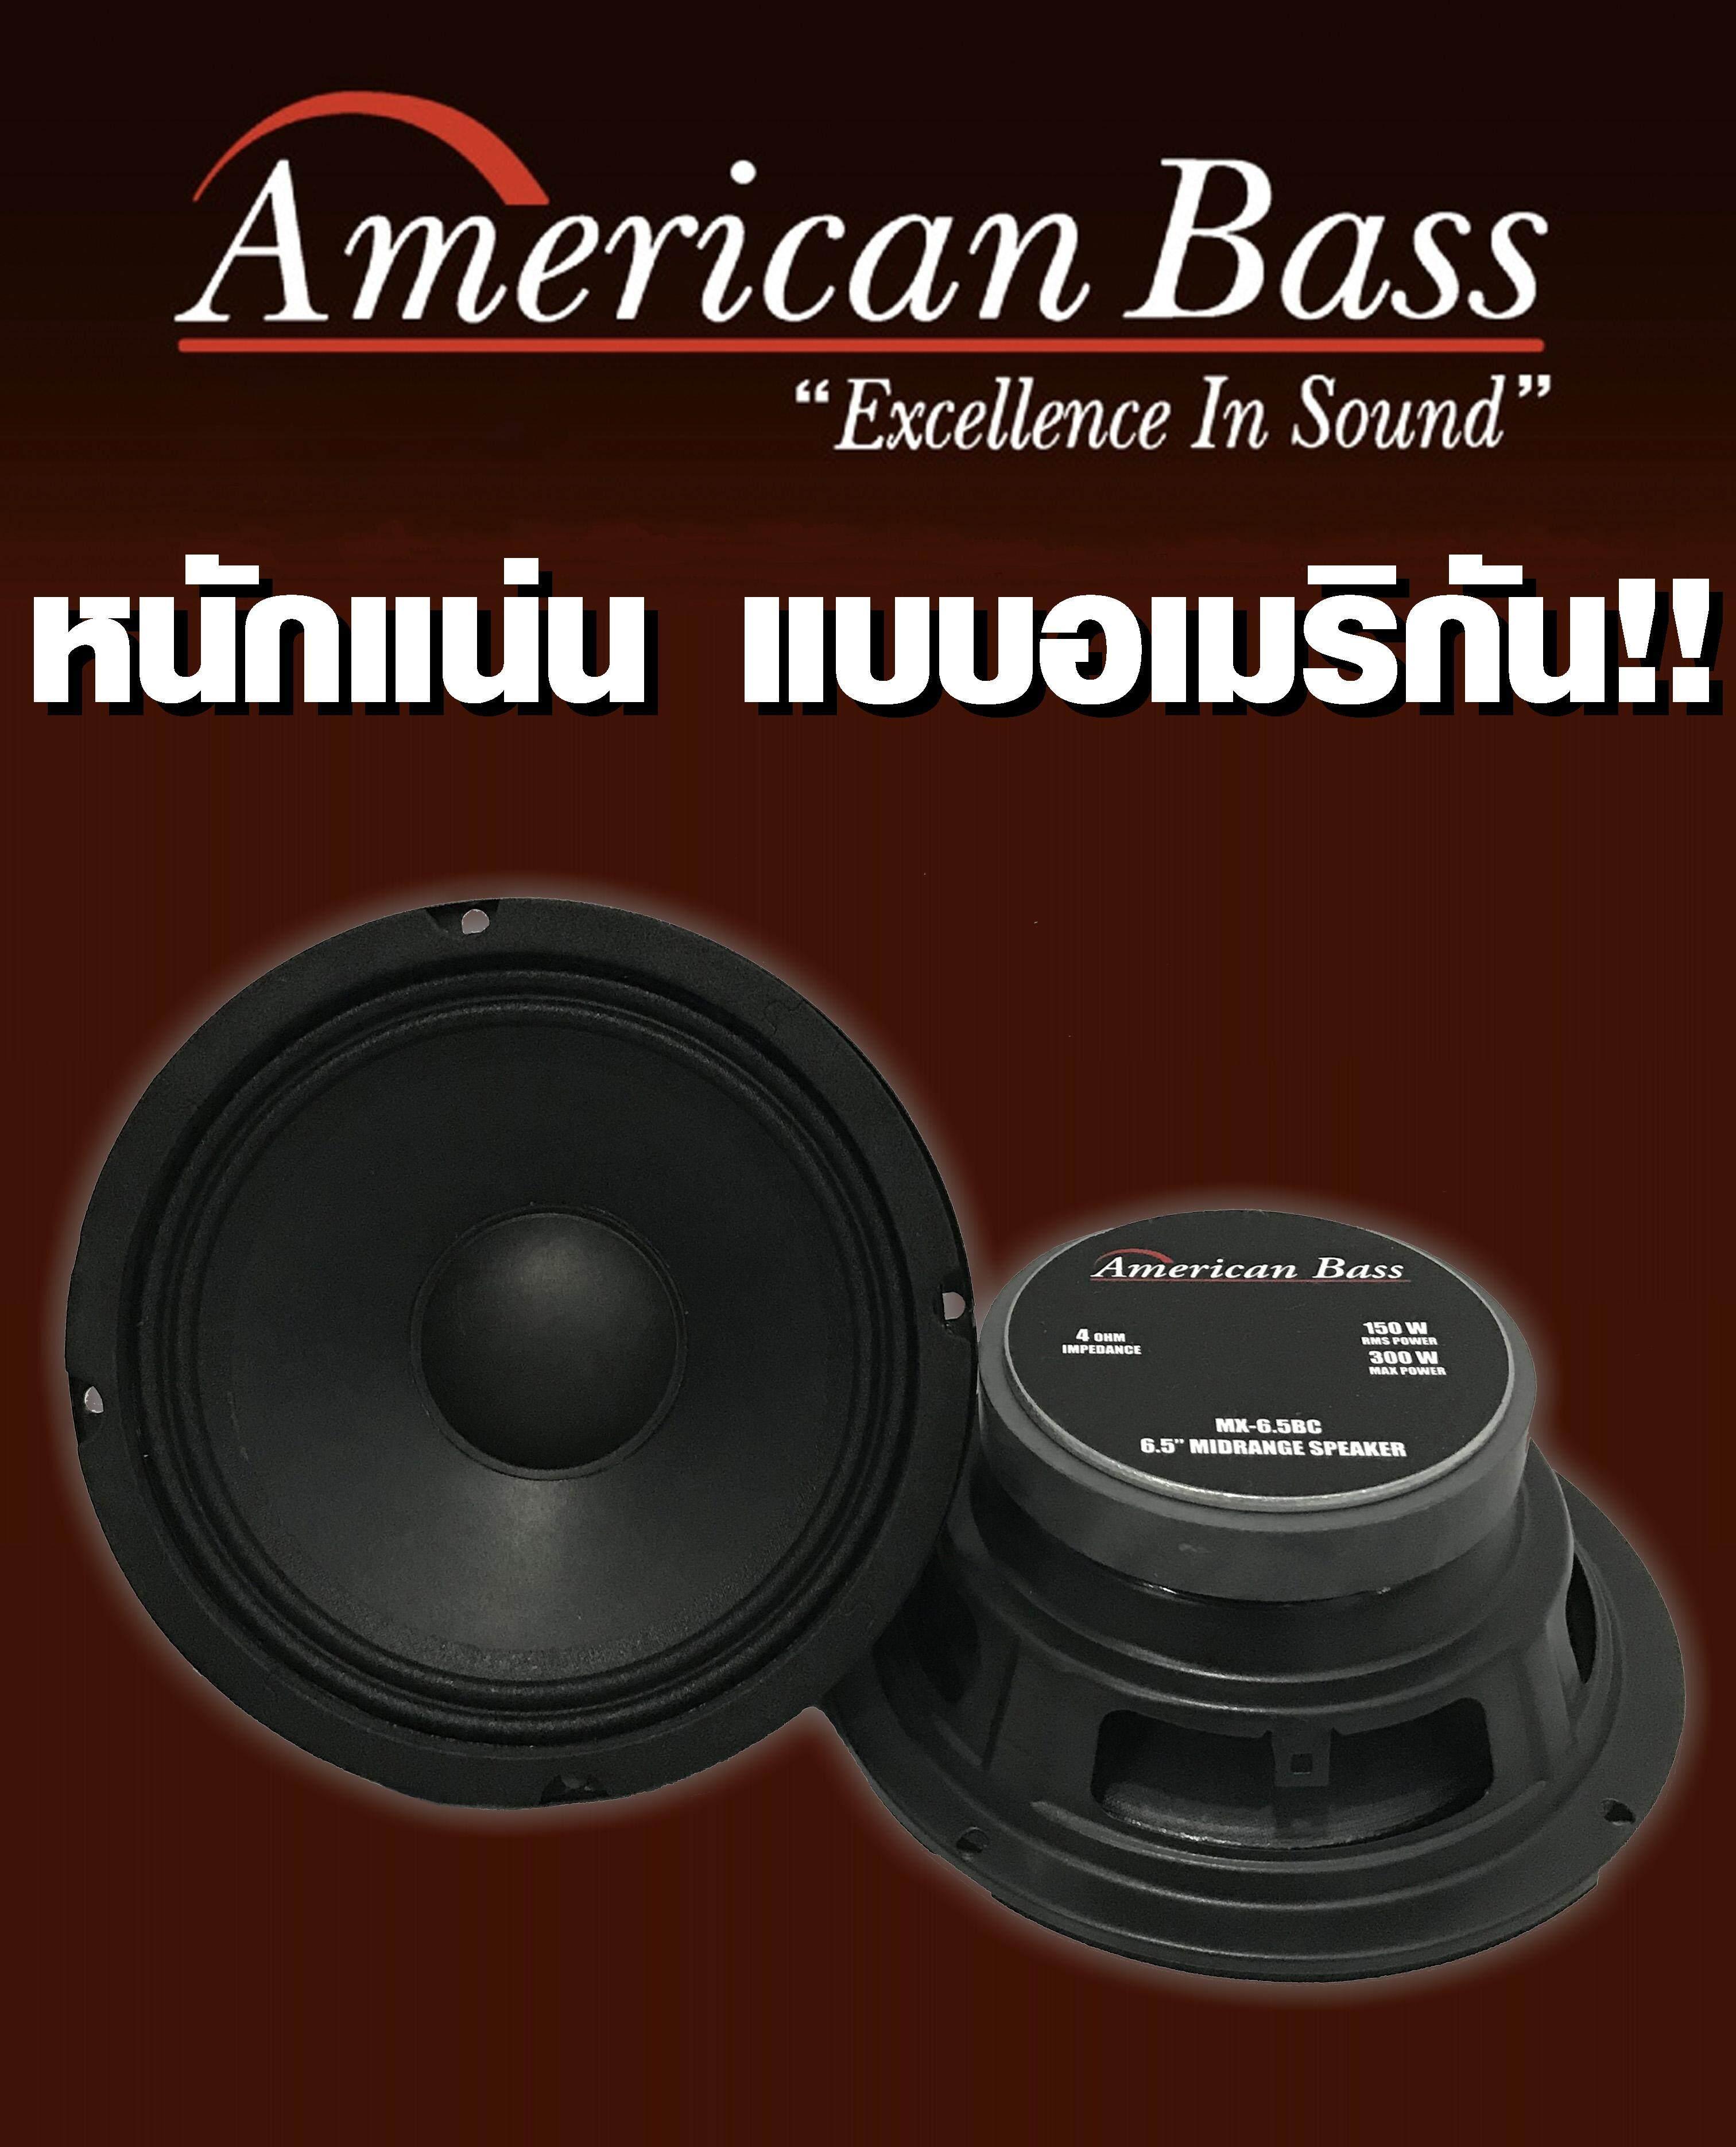 American Bass Mx-6.5bc ลำโพงเสียงกลาง 6.5นิ้ว ดังจริง เสียงใสชัดแน่นจำนวน 1คู่ By Music Extreme.